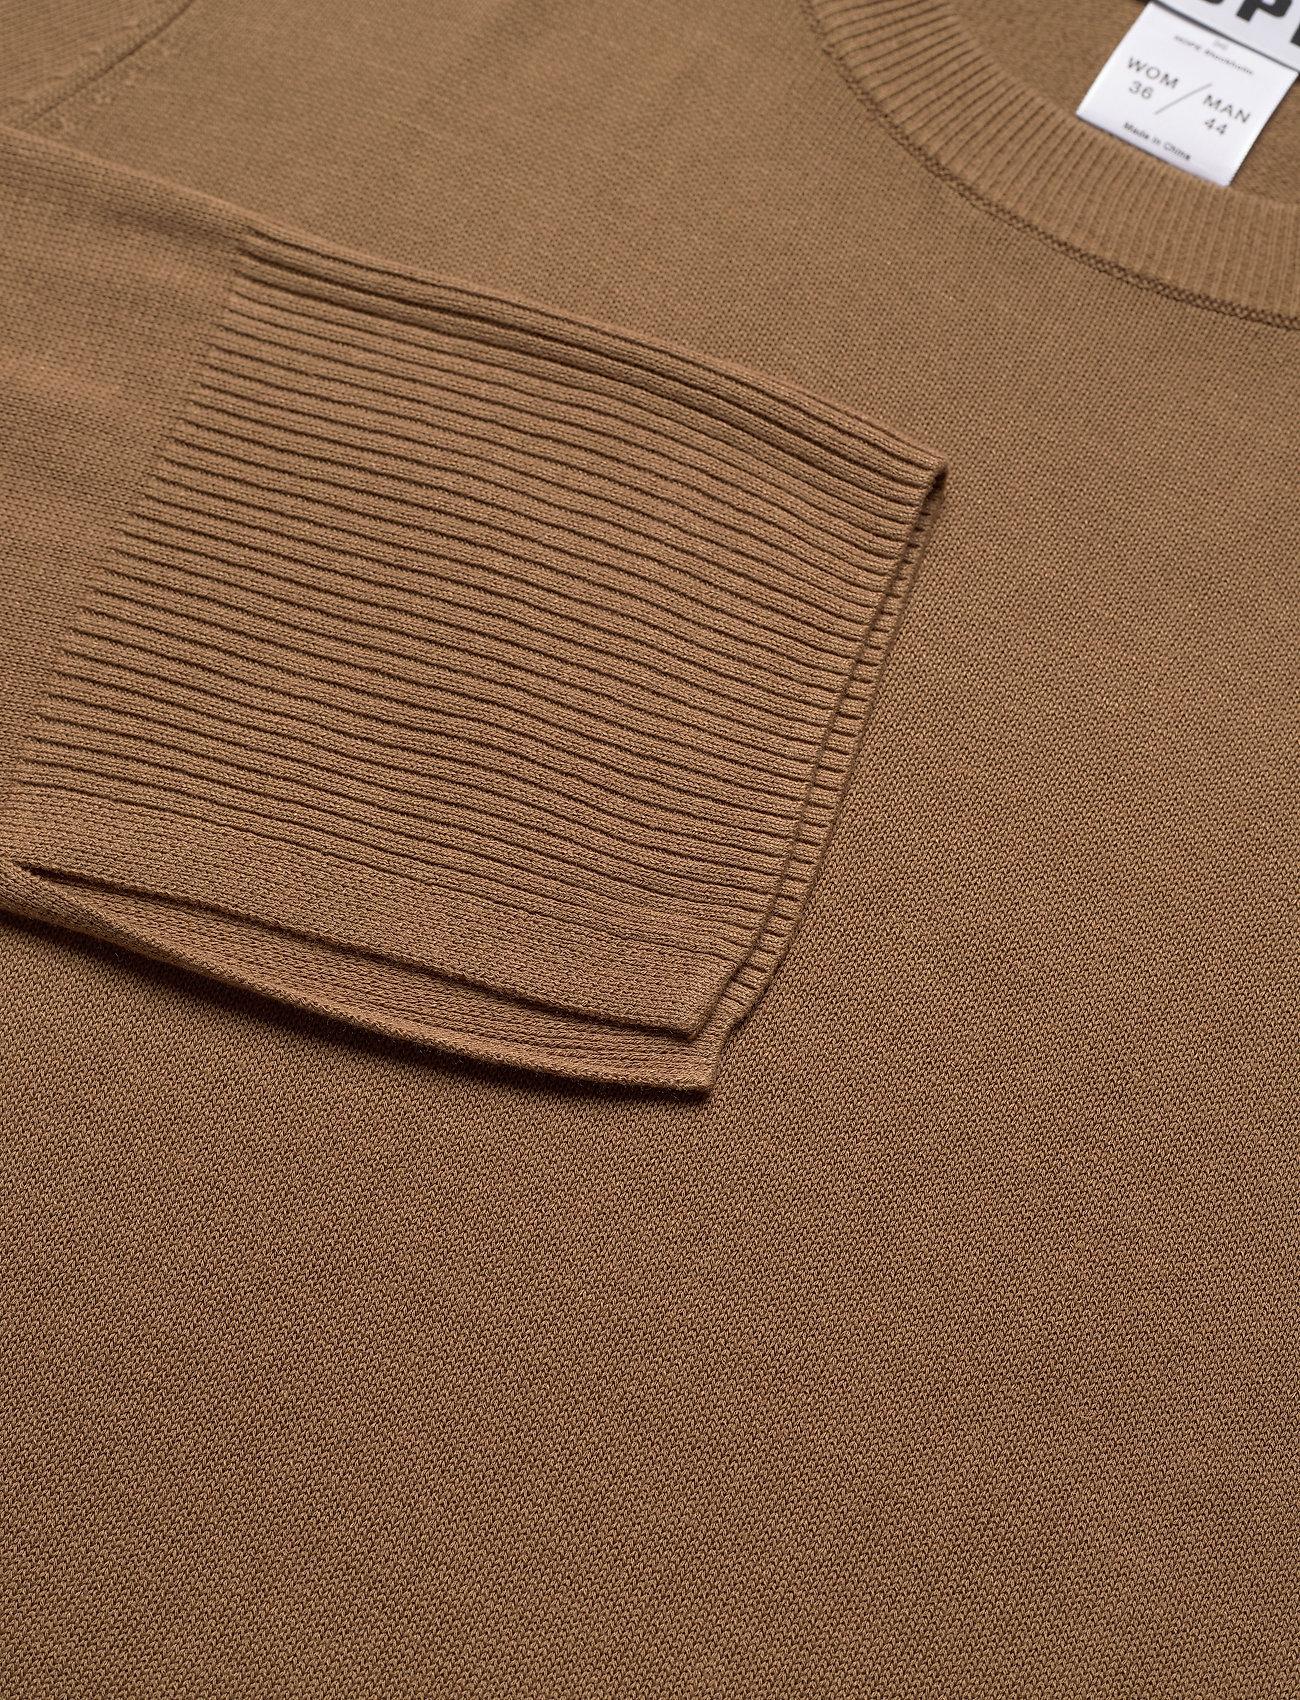 Hope Pin Sweater - Stickat Oak Brown